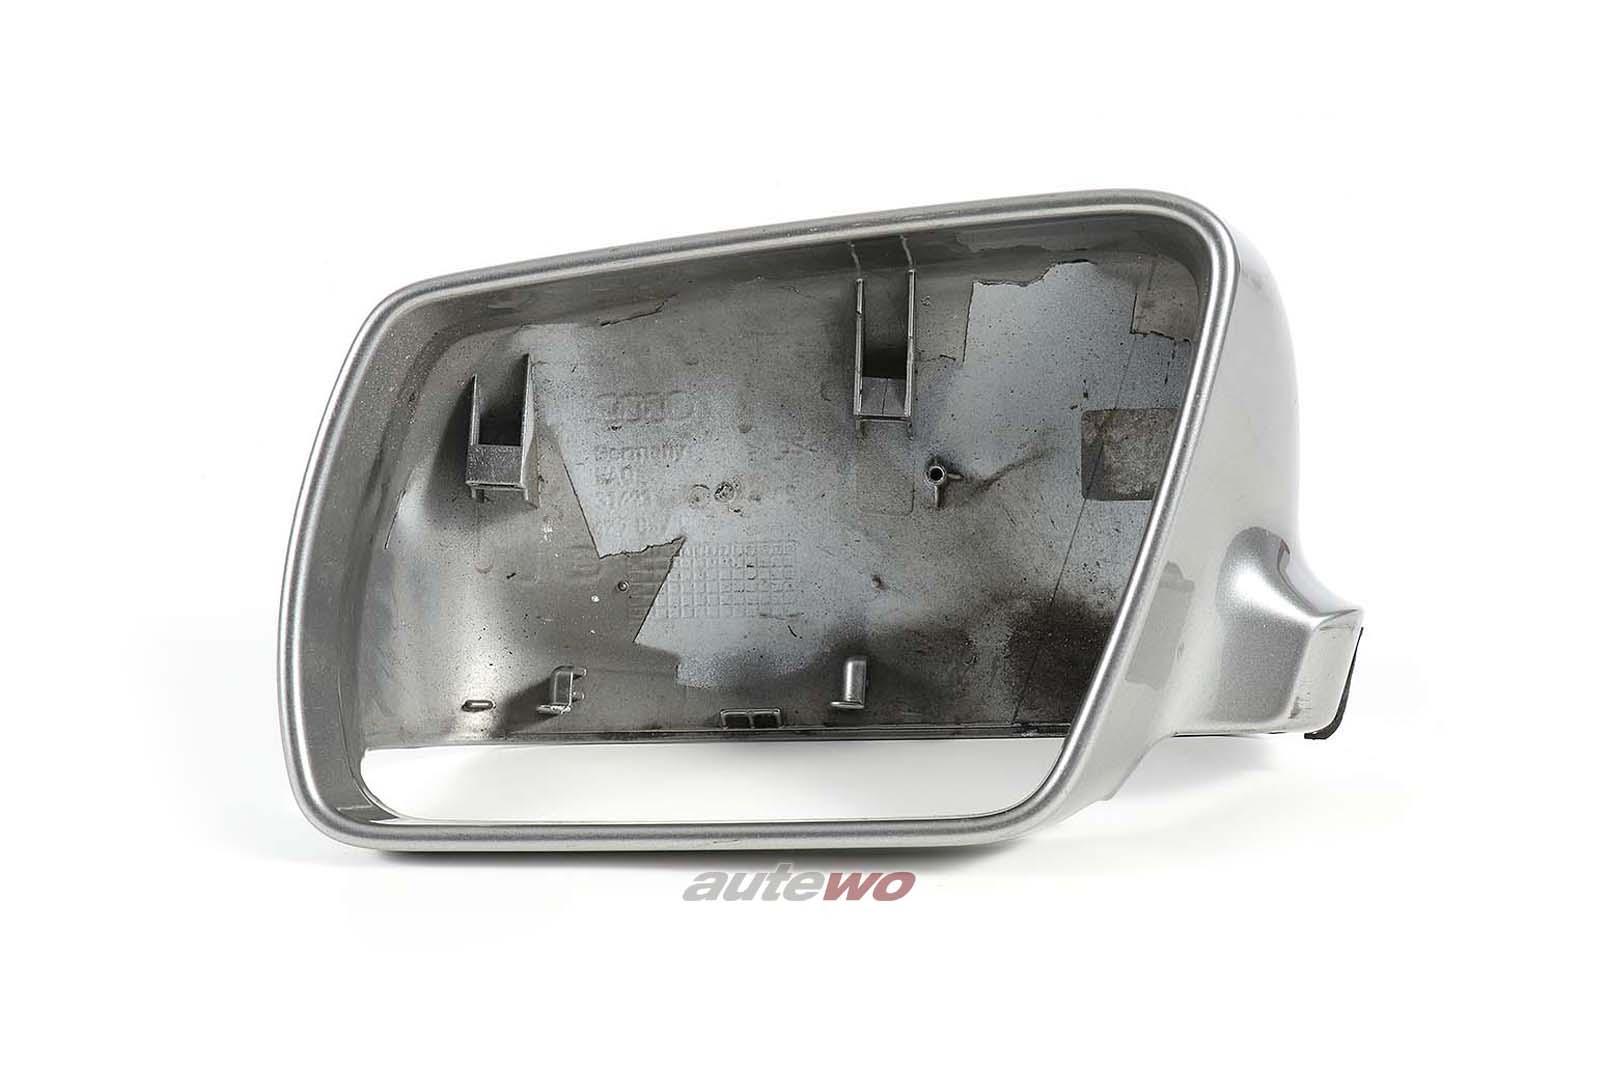 4Z7857507 Audi A6 Allroad 4B Abdeckkappe Außenspiegel Links LY7Q atlasgrau